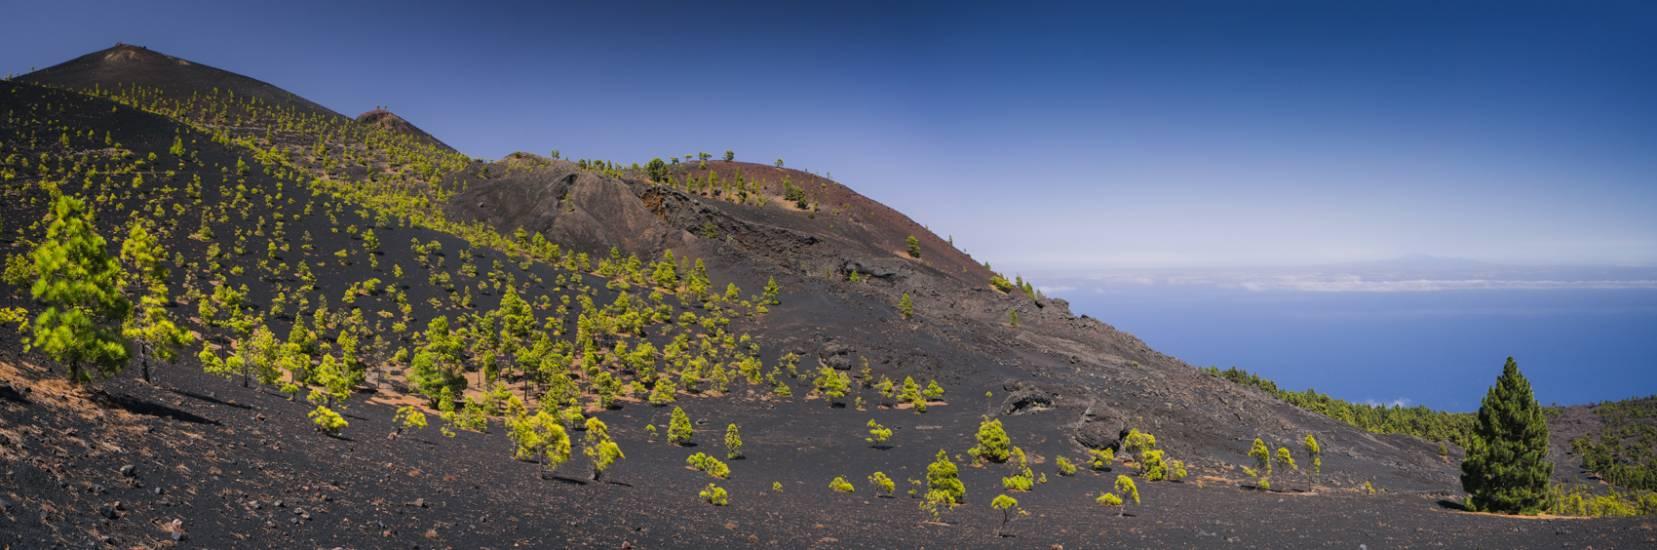 Photo Voyages : Îles Canaries #22